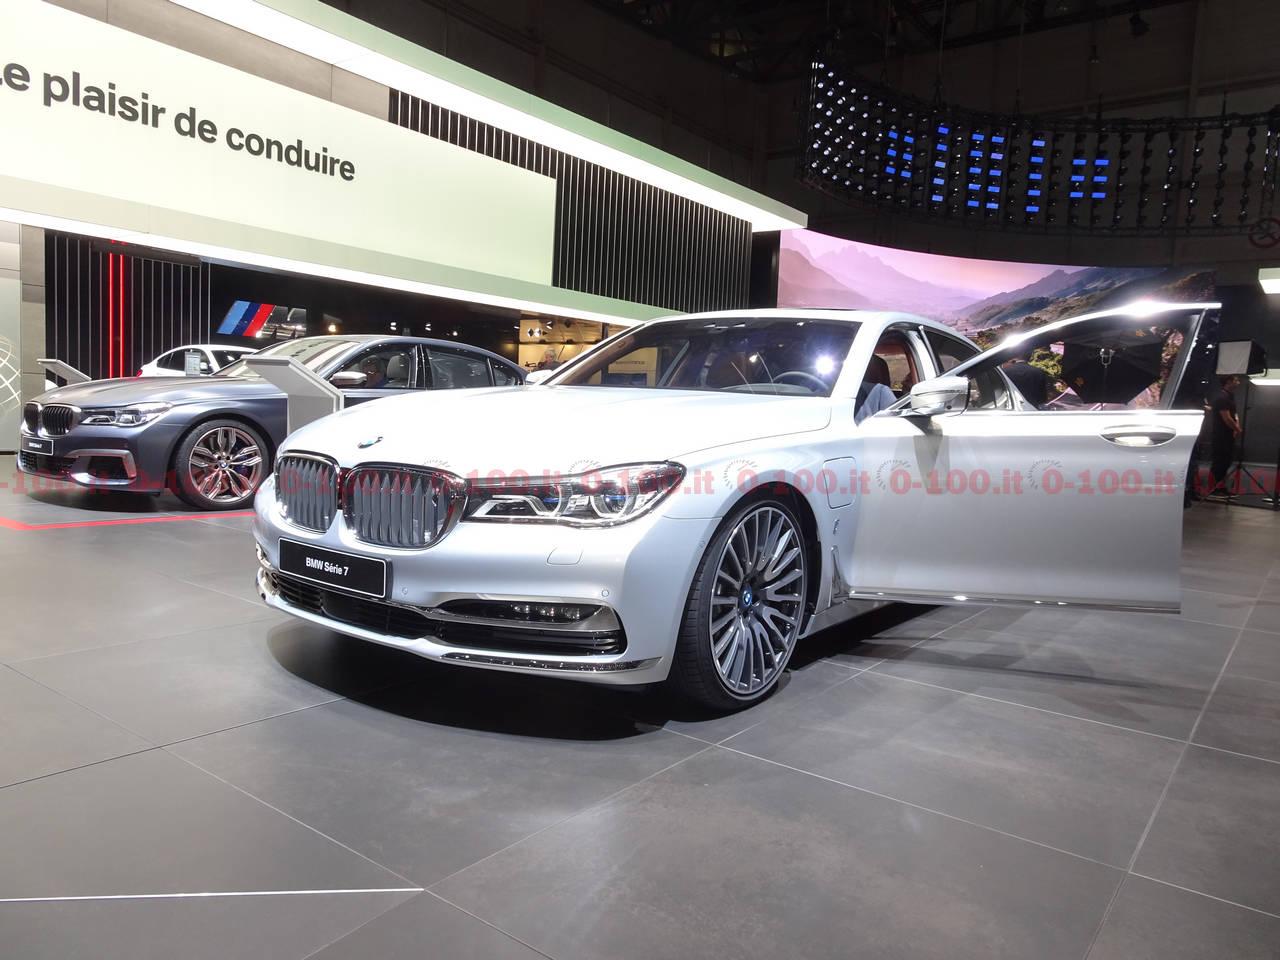 Ginevra-geneva-geneve-2017-BMW_Serie-7_0-100_2